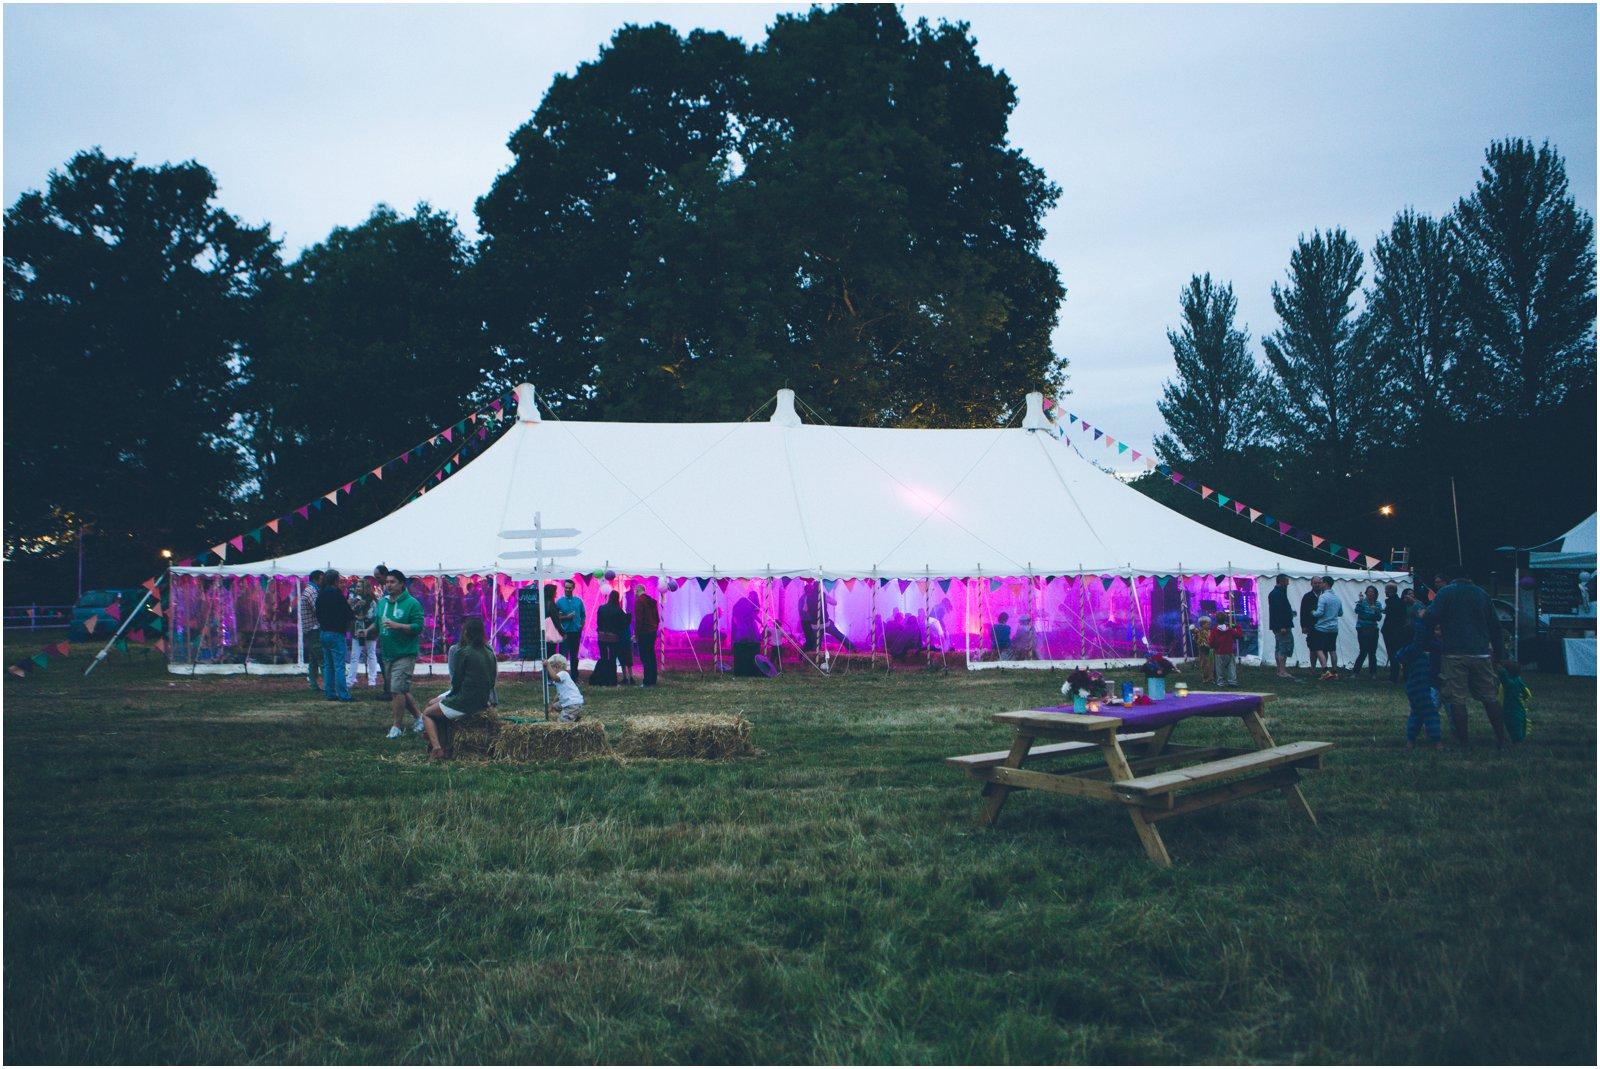 Sally and Damien's wedding festival by Summertown Pictures-86_DerrynSchmidt